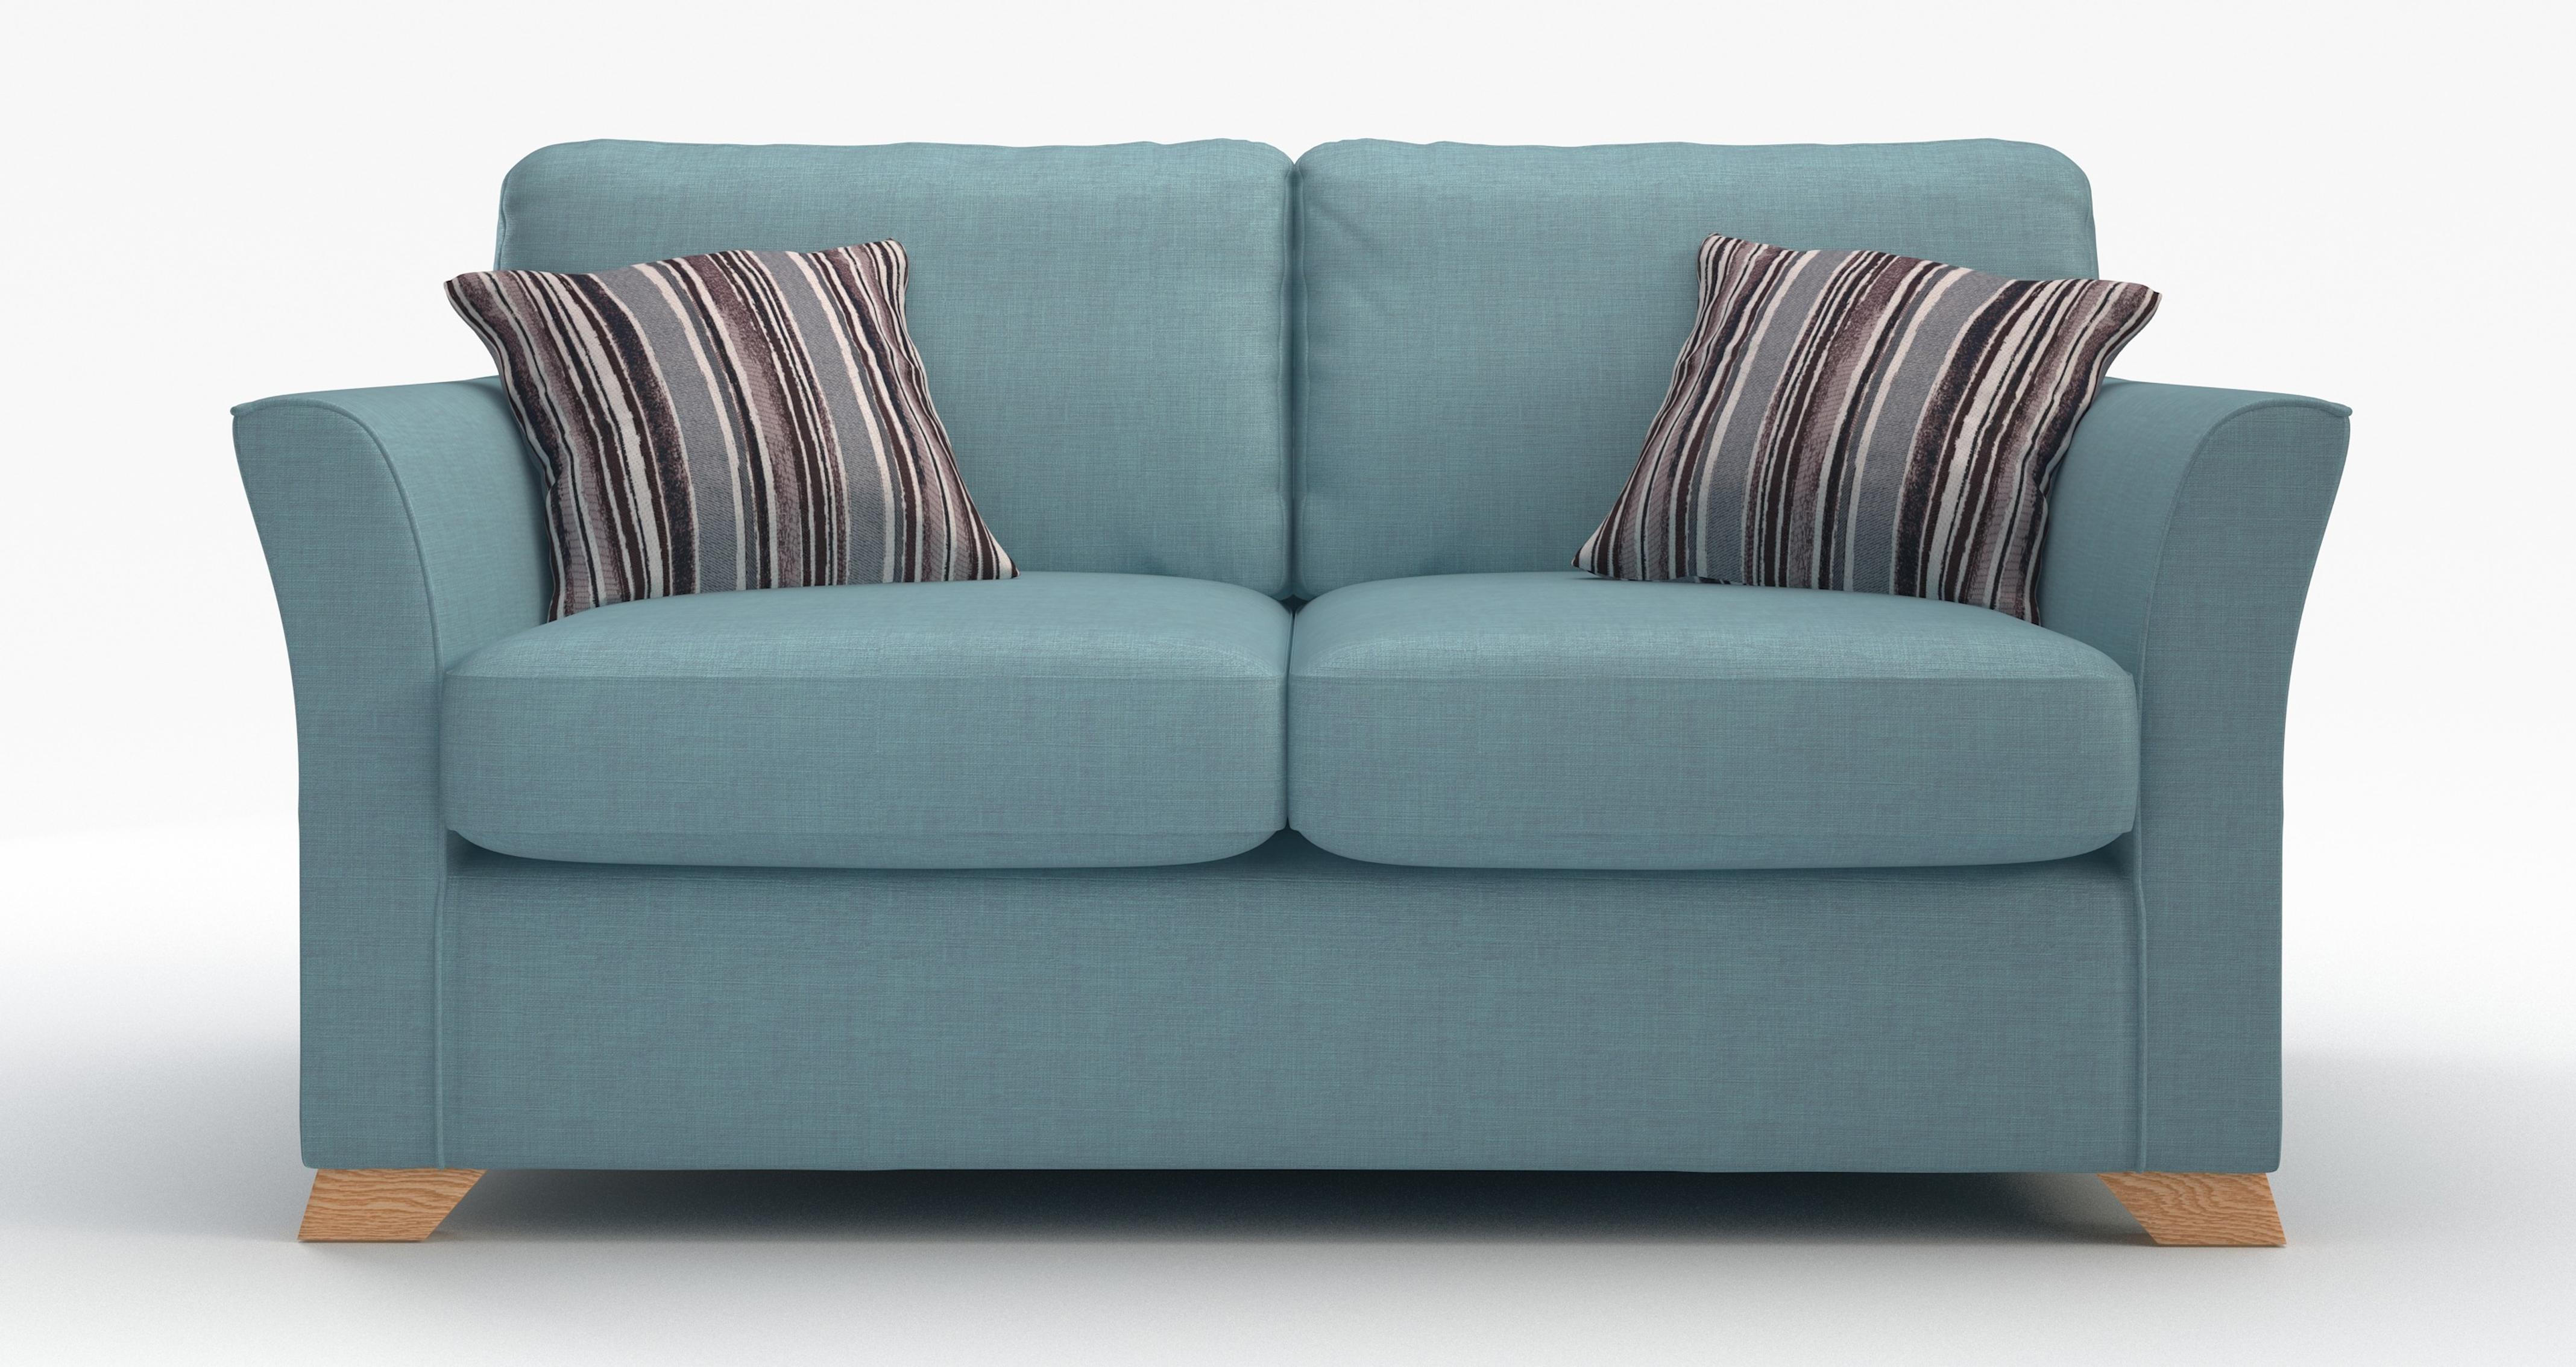 DFS Zuma Fabric Range - 3 Seater, 2 Str, Sofa Bed ...